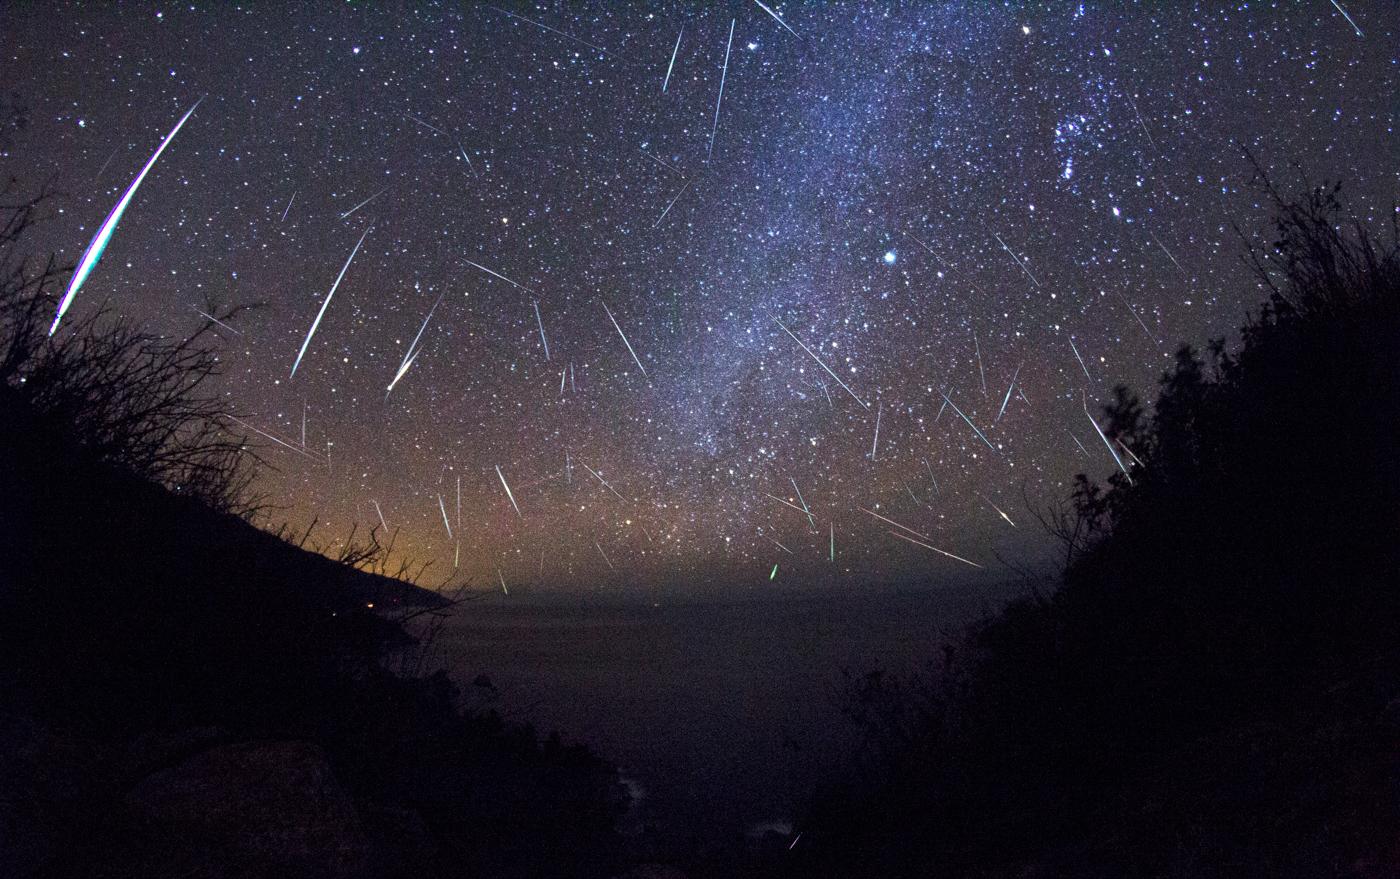 orionid-meteor-shower-october-2015-2